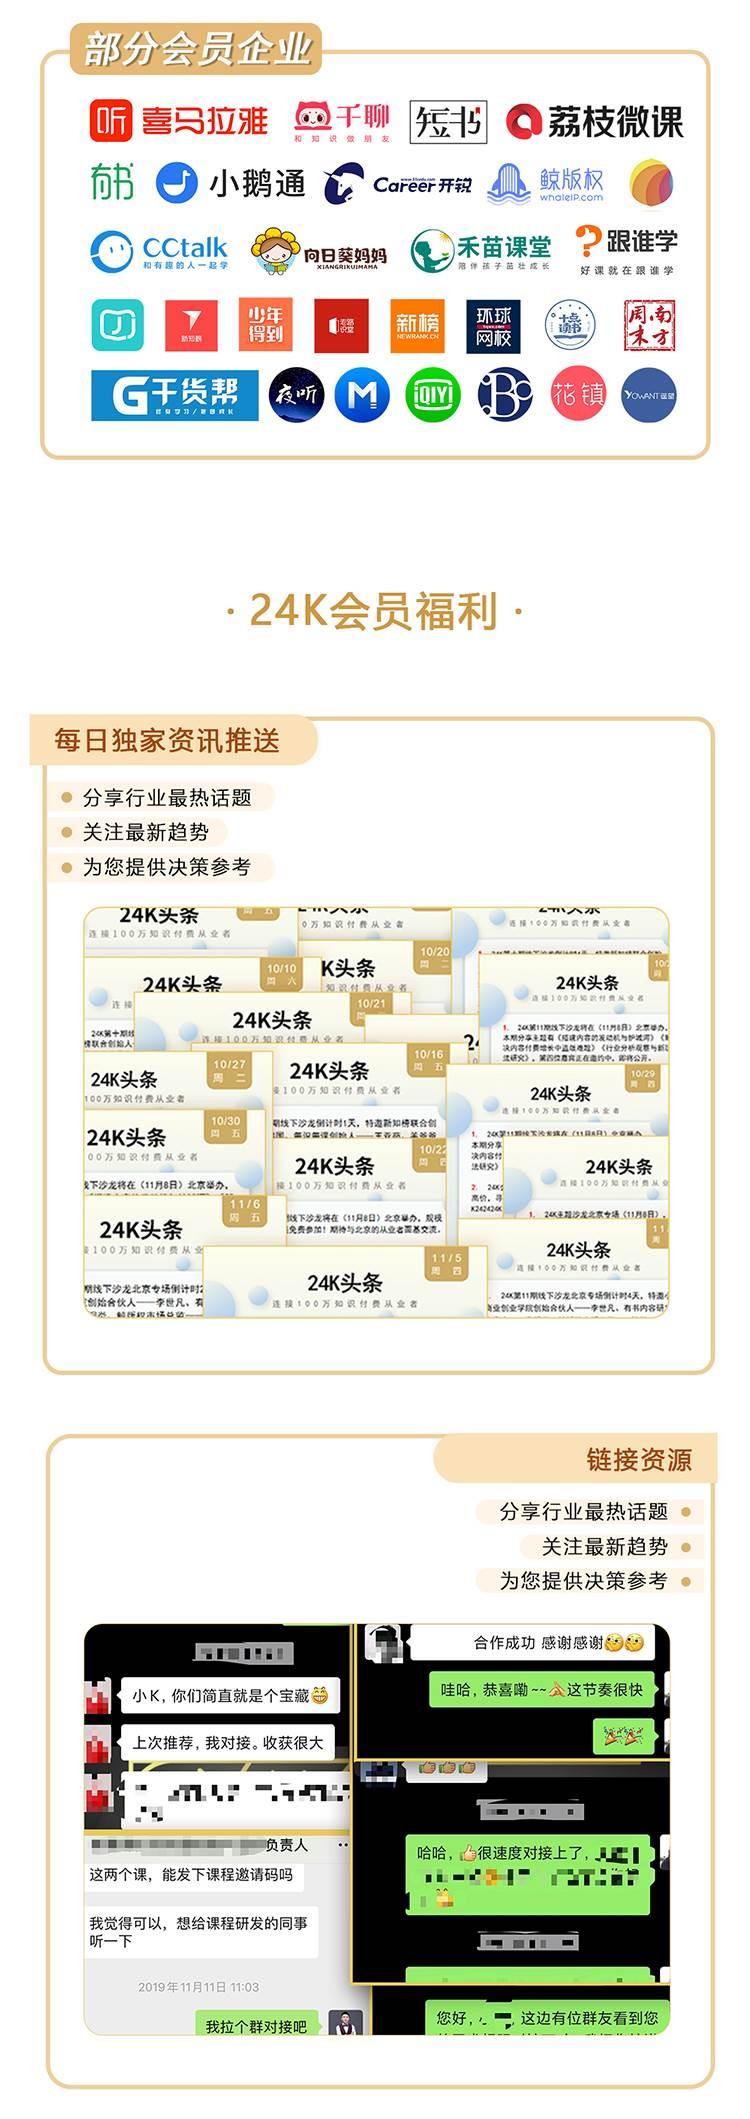 24K会员招募海报-2020最新_02.jpg